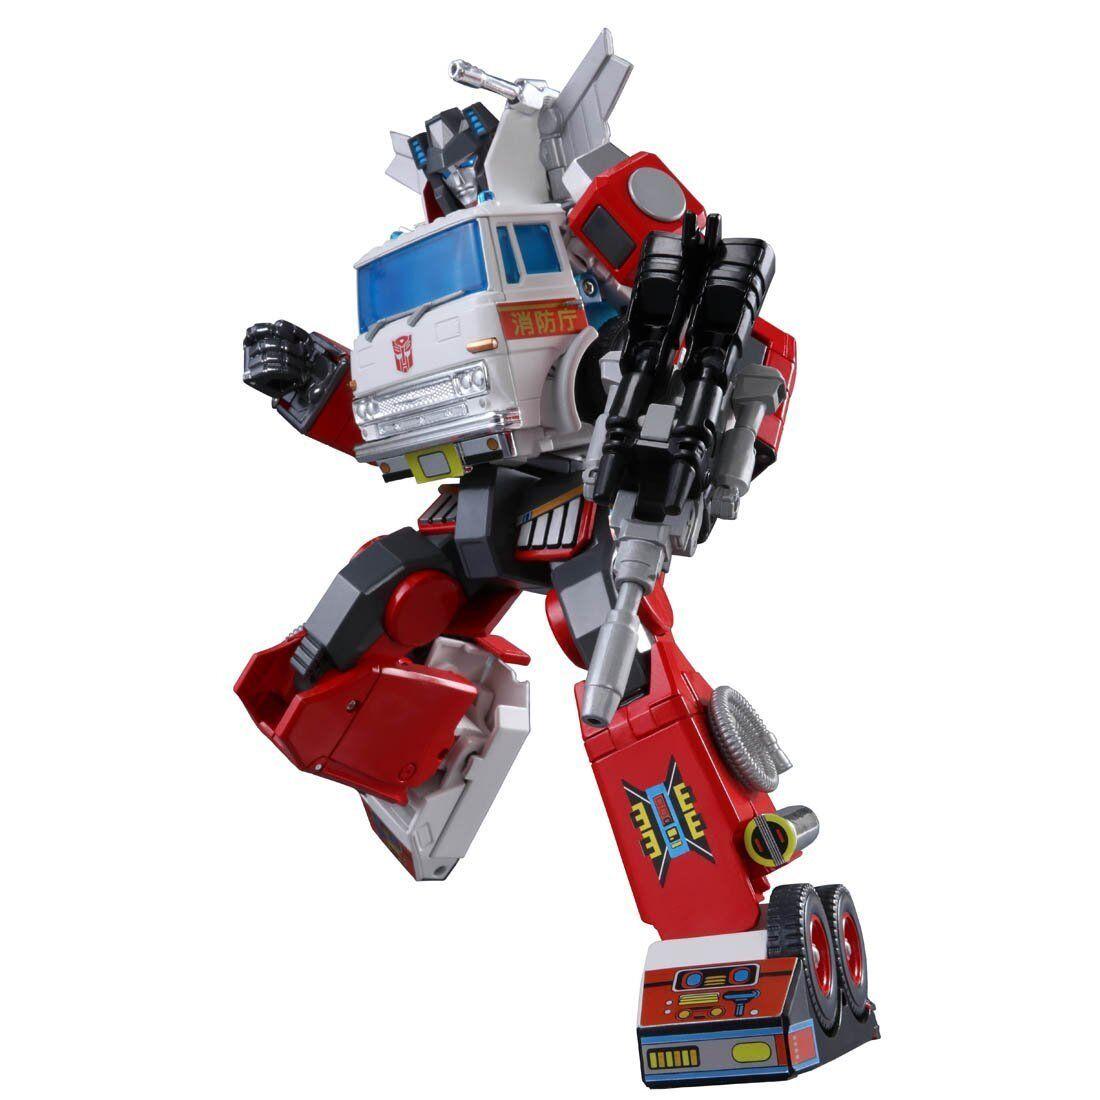 Takara Tomy Transformers Masterpiece MP-37 Artfire Figure JAPAN OFFICIAL IMPORT